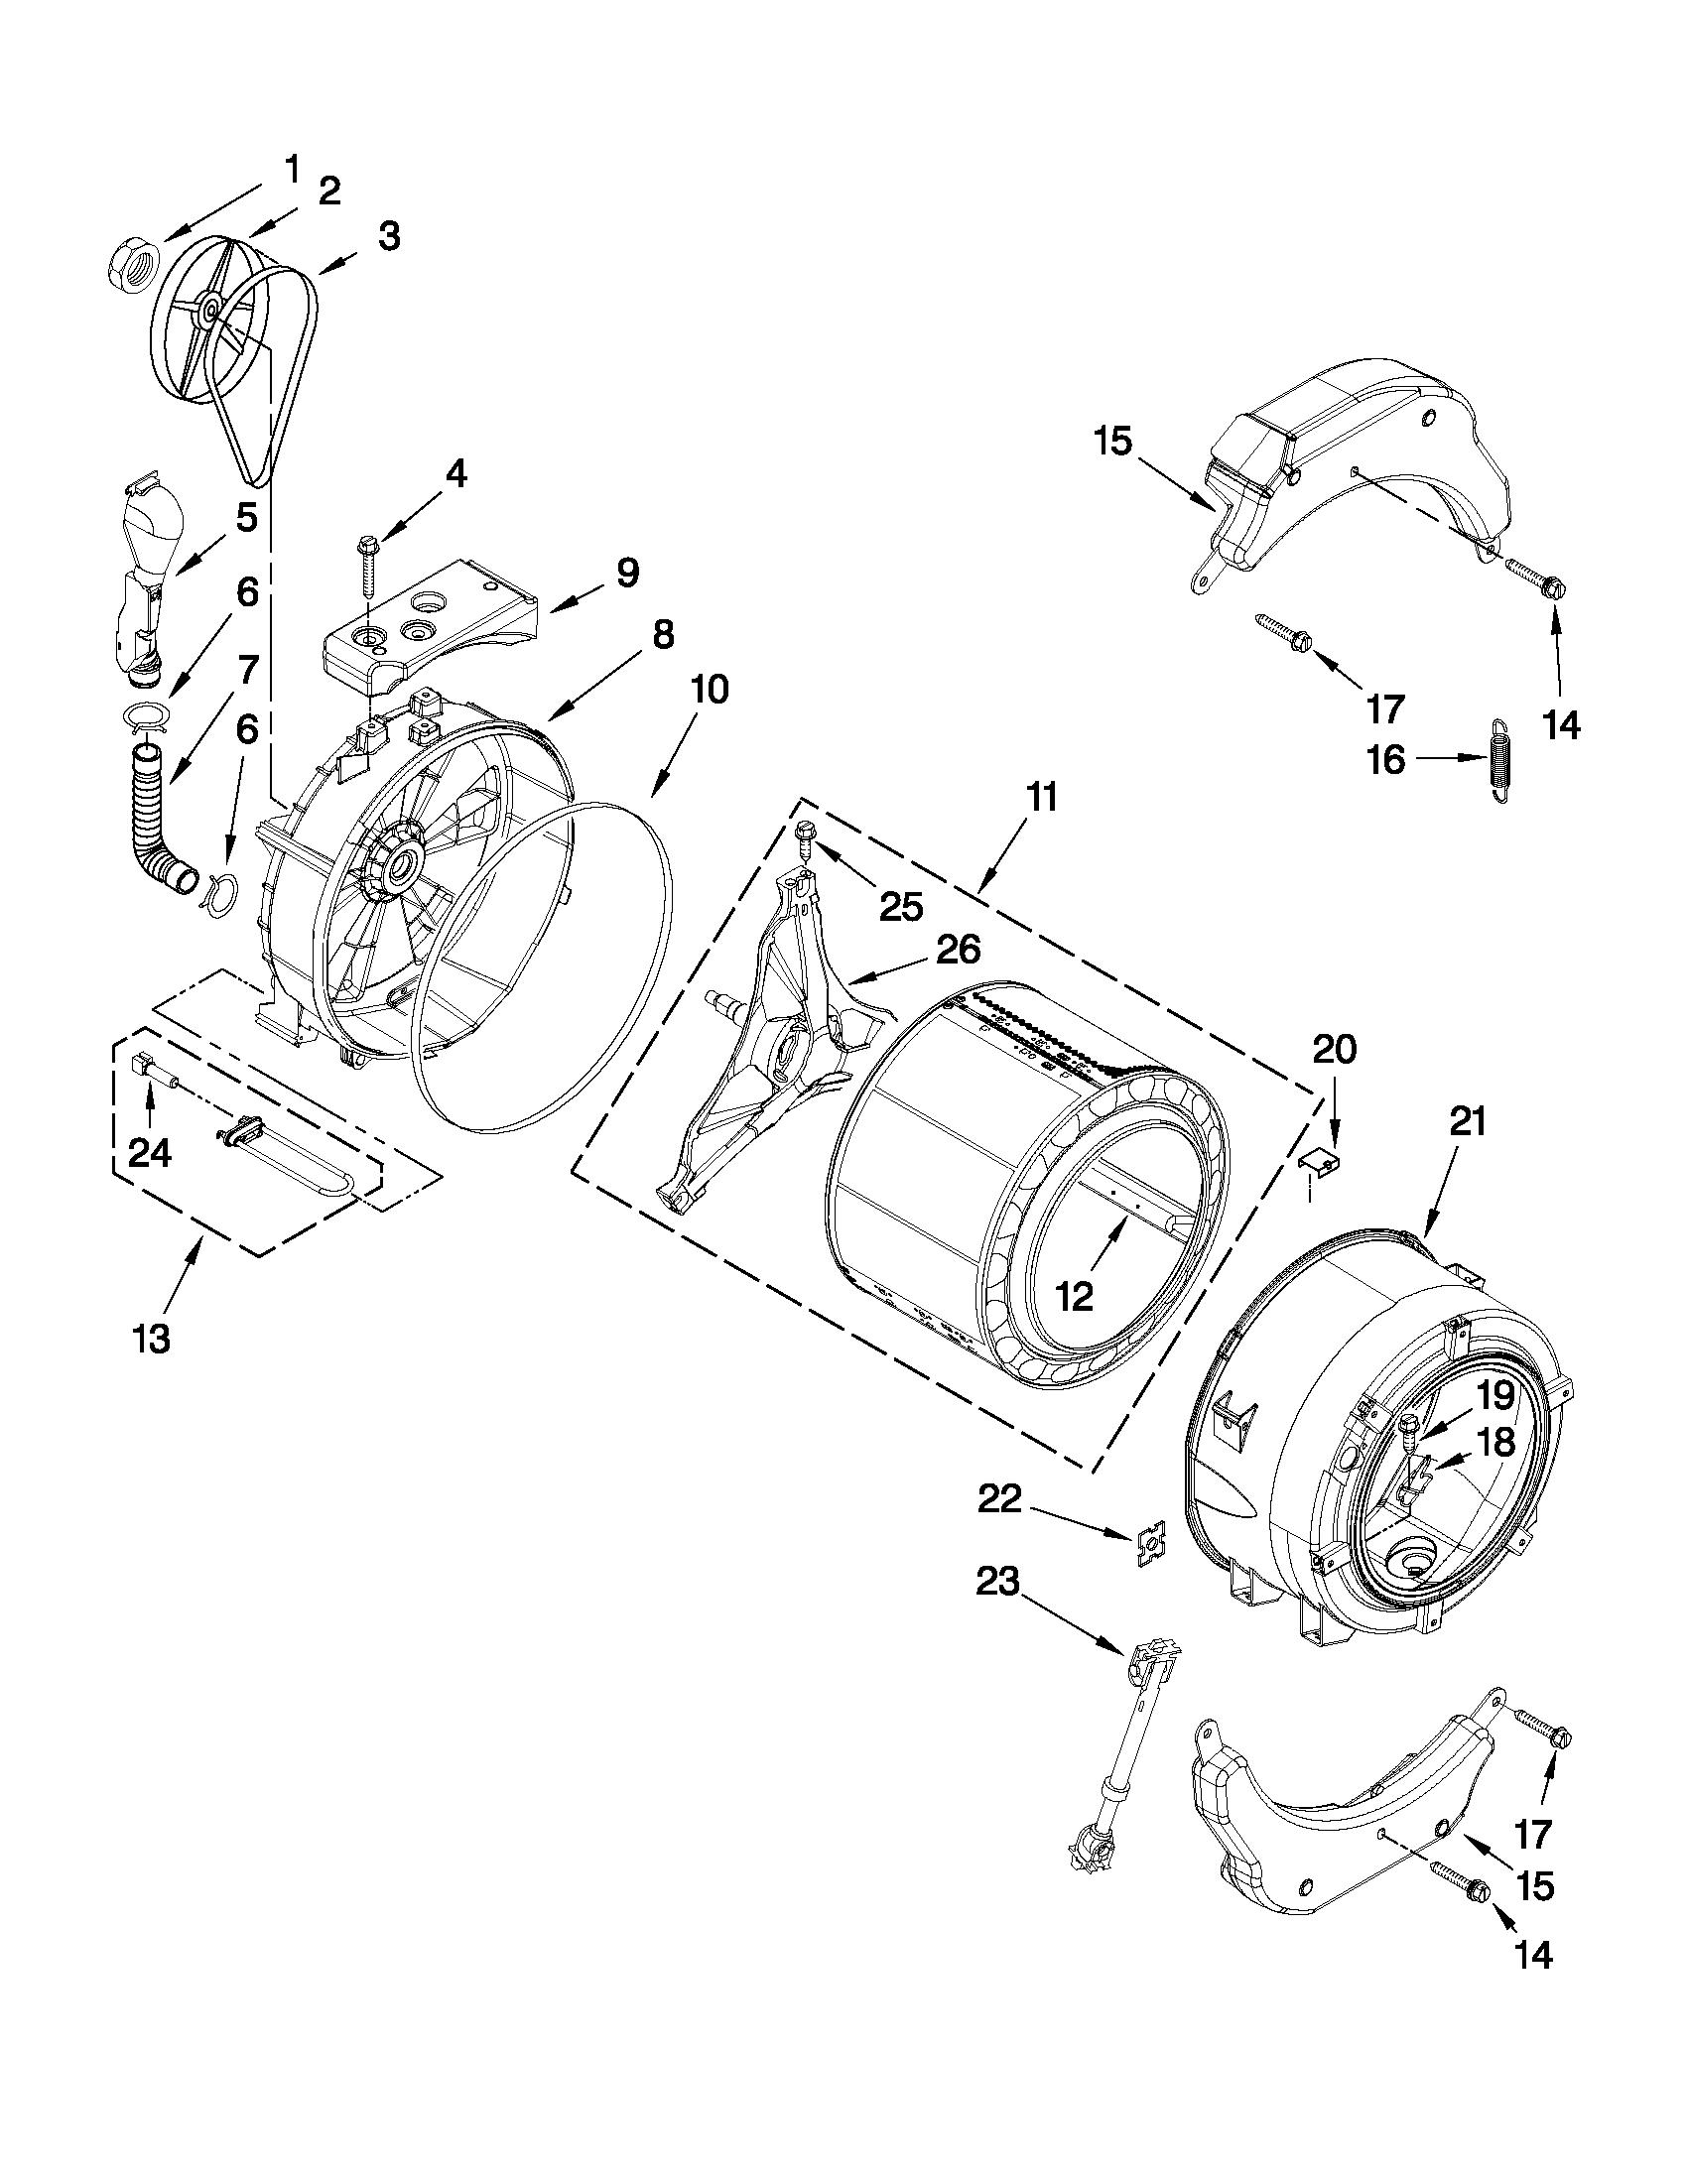 Whirlpool Duet Wfw9250ww02 Has Code F3 E2